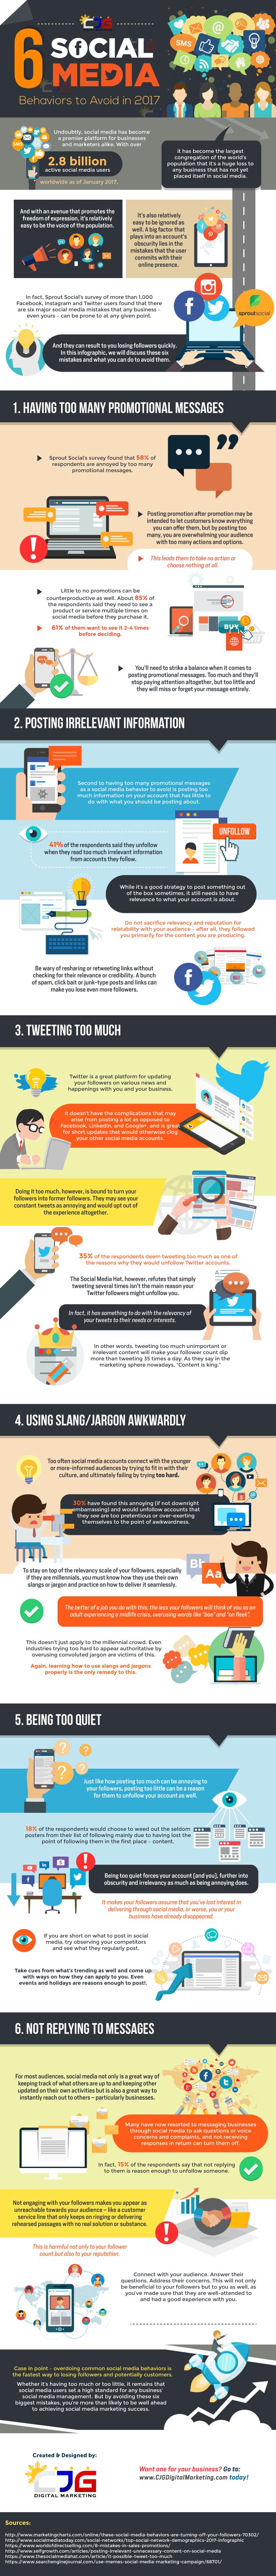 6 comportamientos en social media que deberías evitar a toda costa